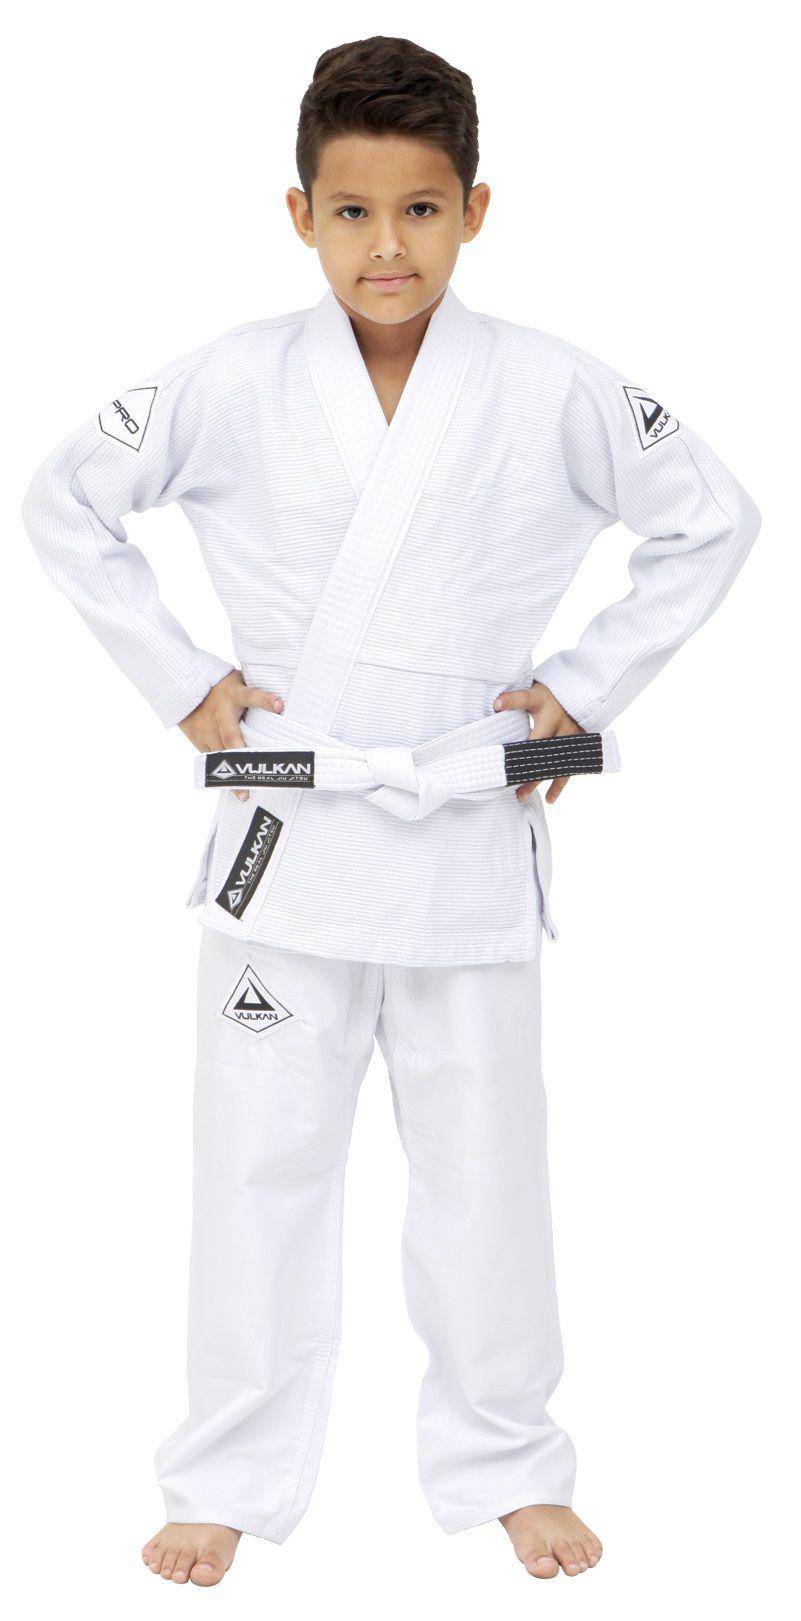 Kimono Vulkan Para Jiu-jitsu Profissional Infantil - Pro Evolution Branco Masculino